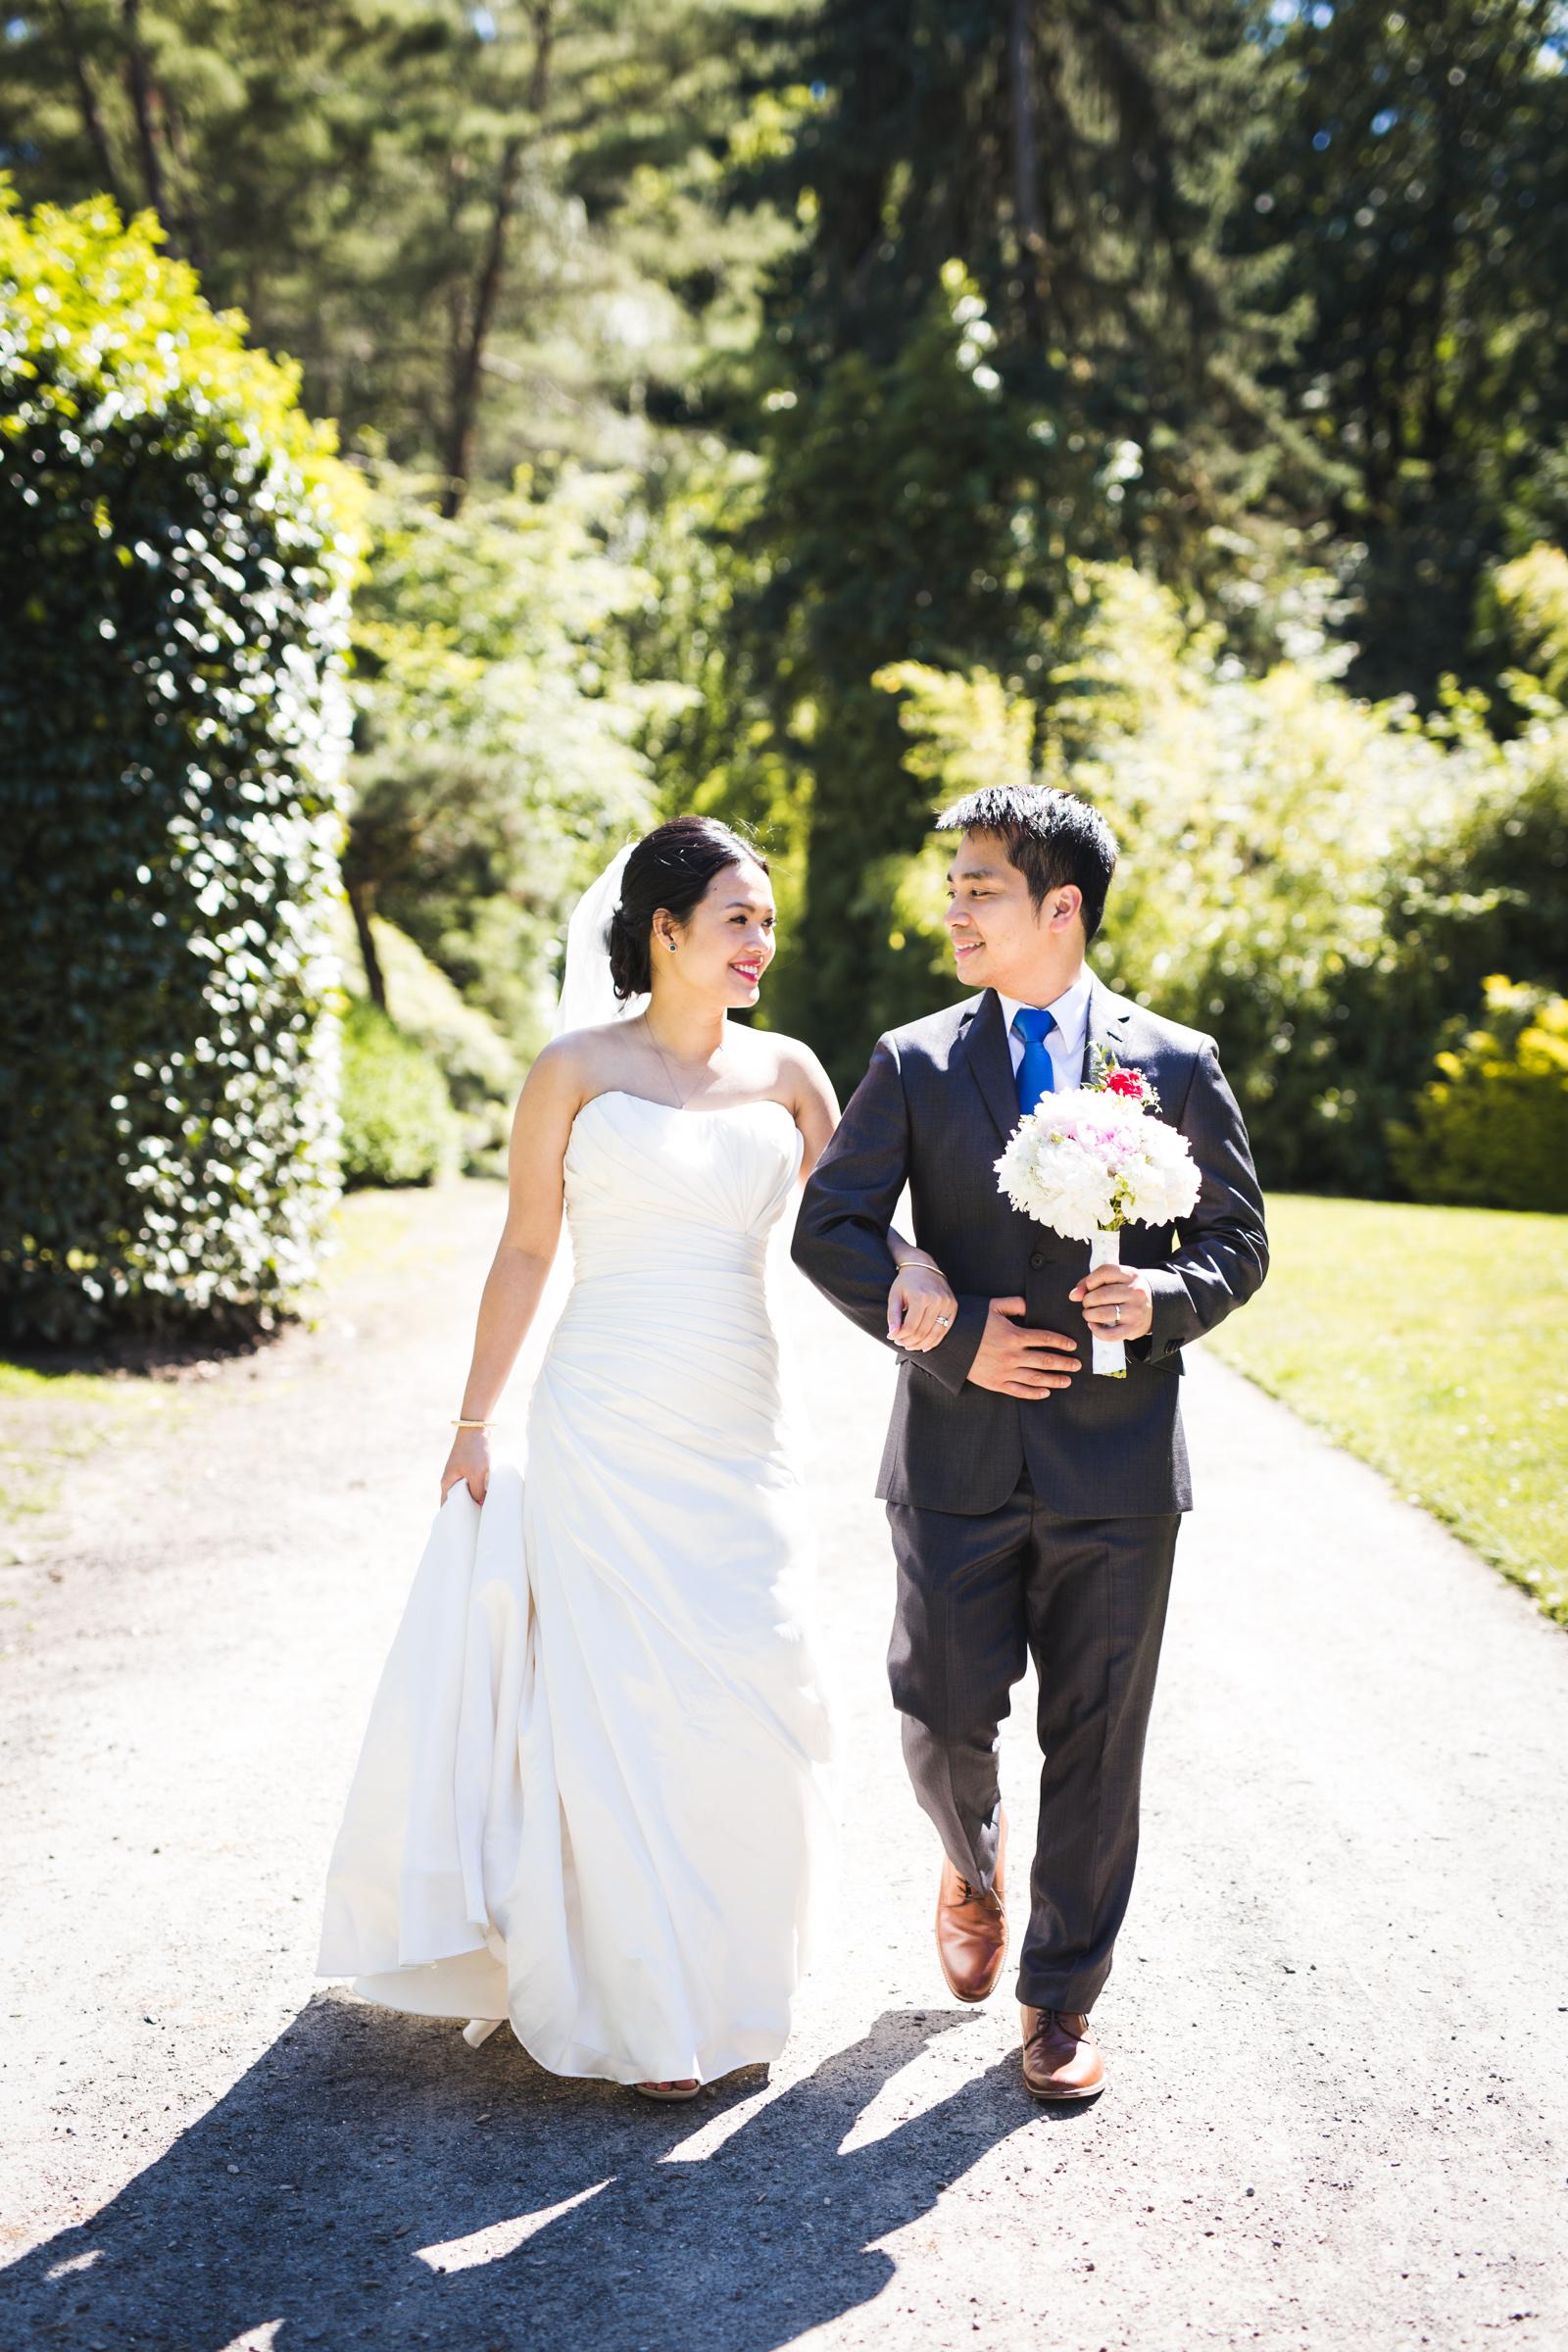 NancyVu-Renton-Wedding-062516-0459.jpg